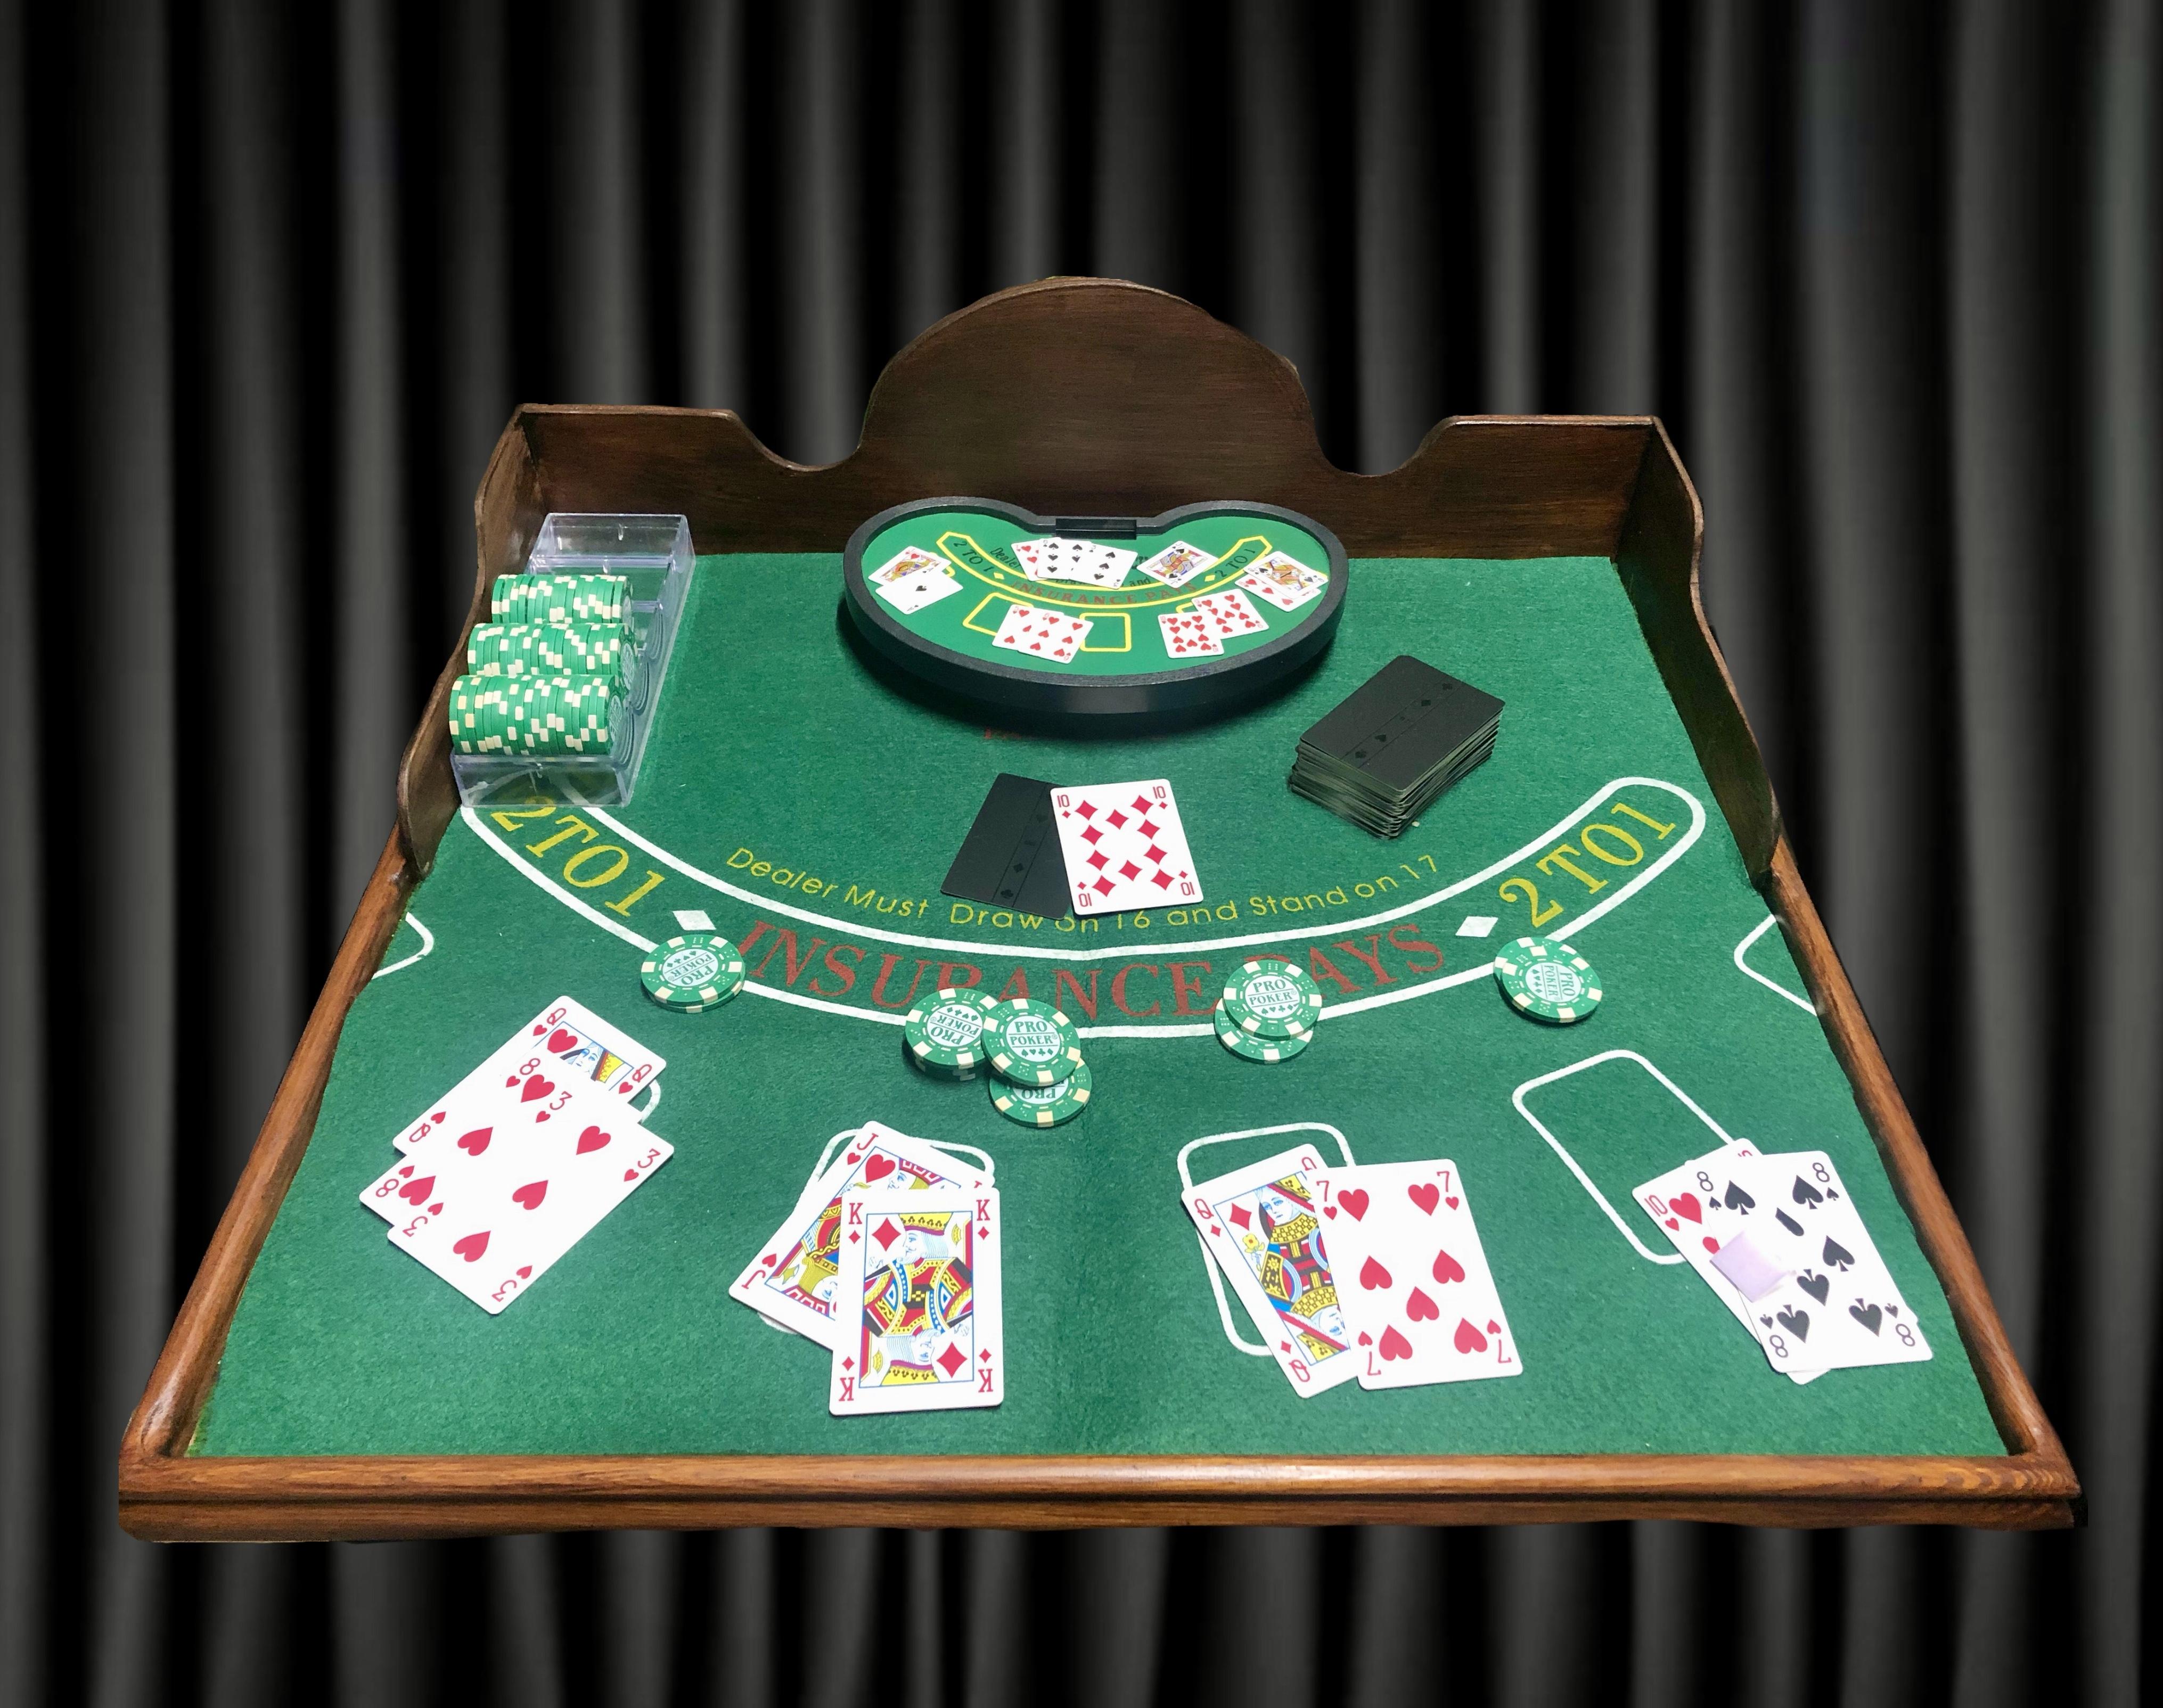 Walking Casino & Games